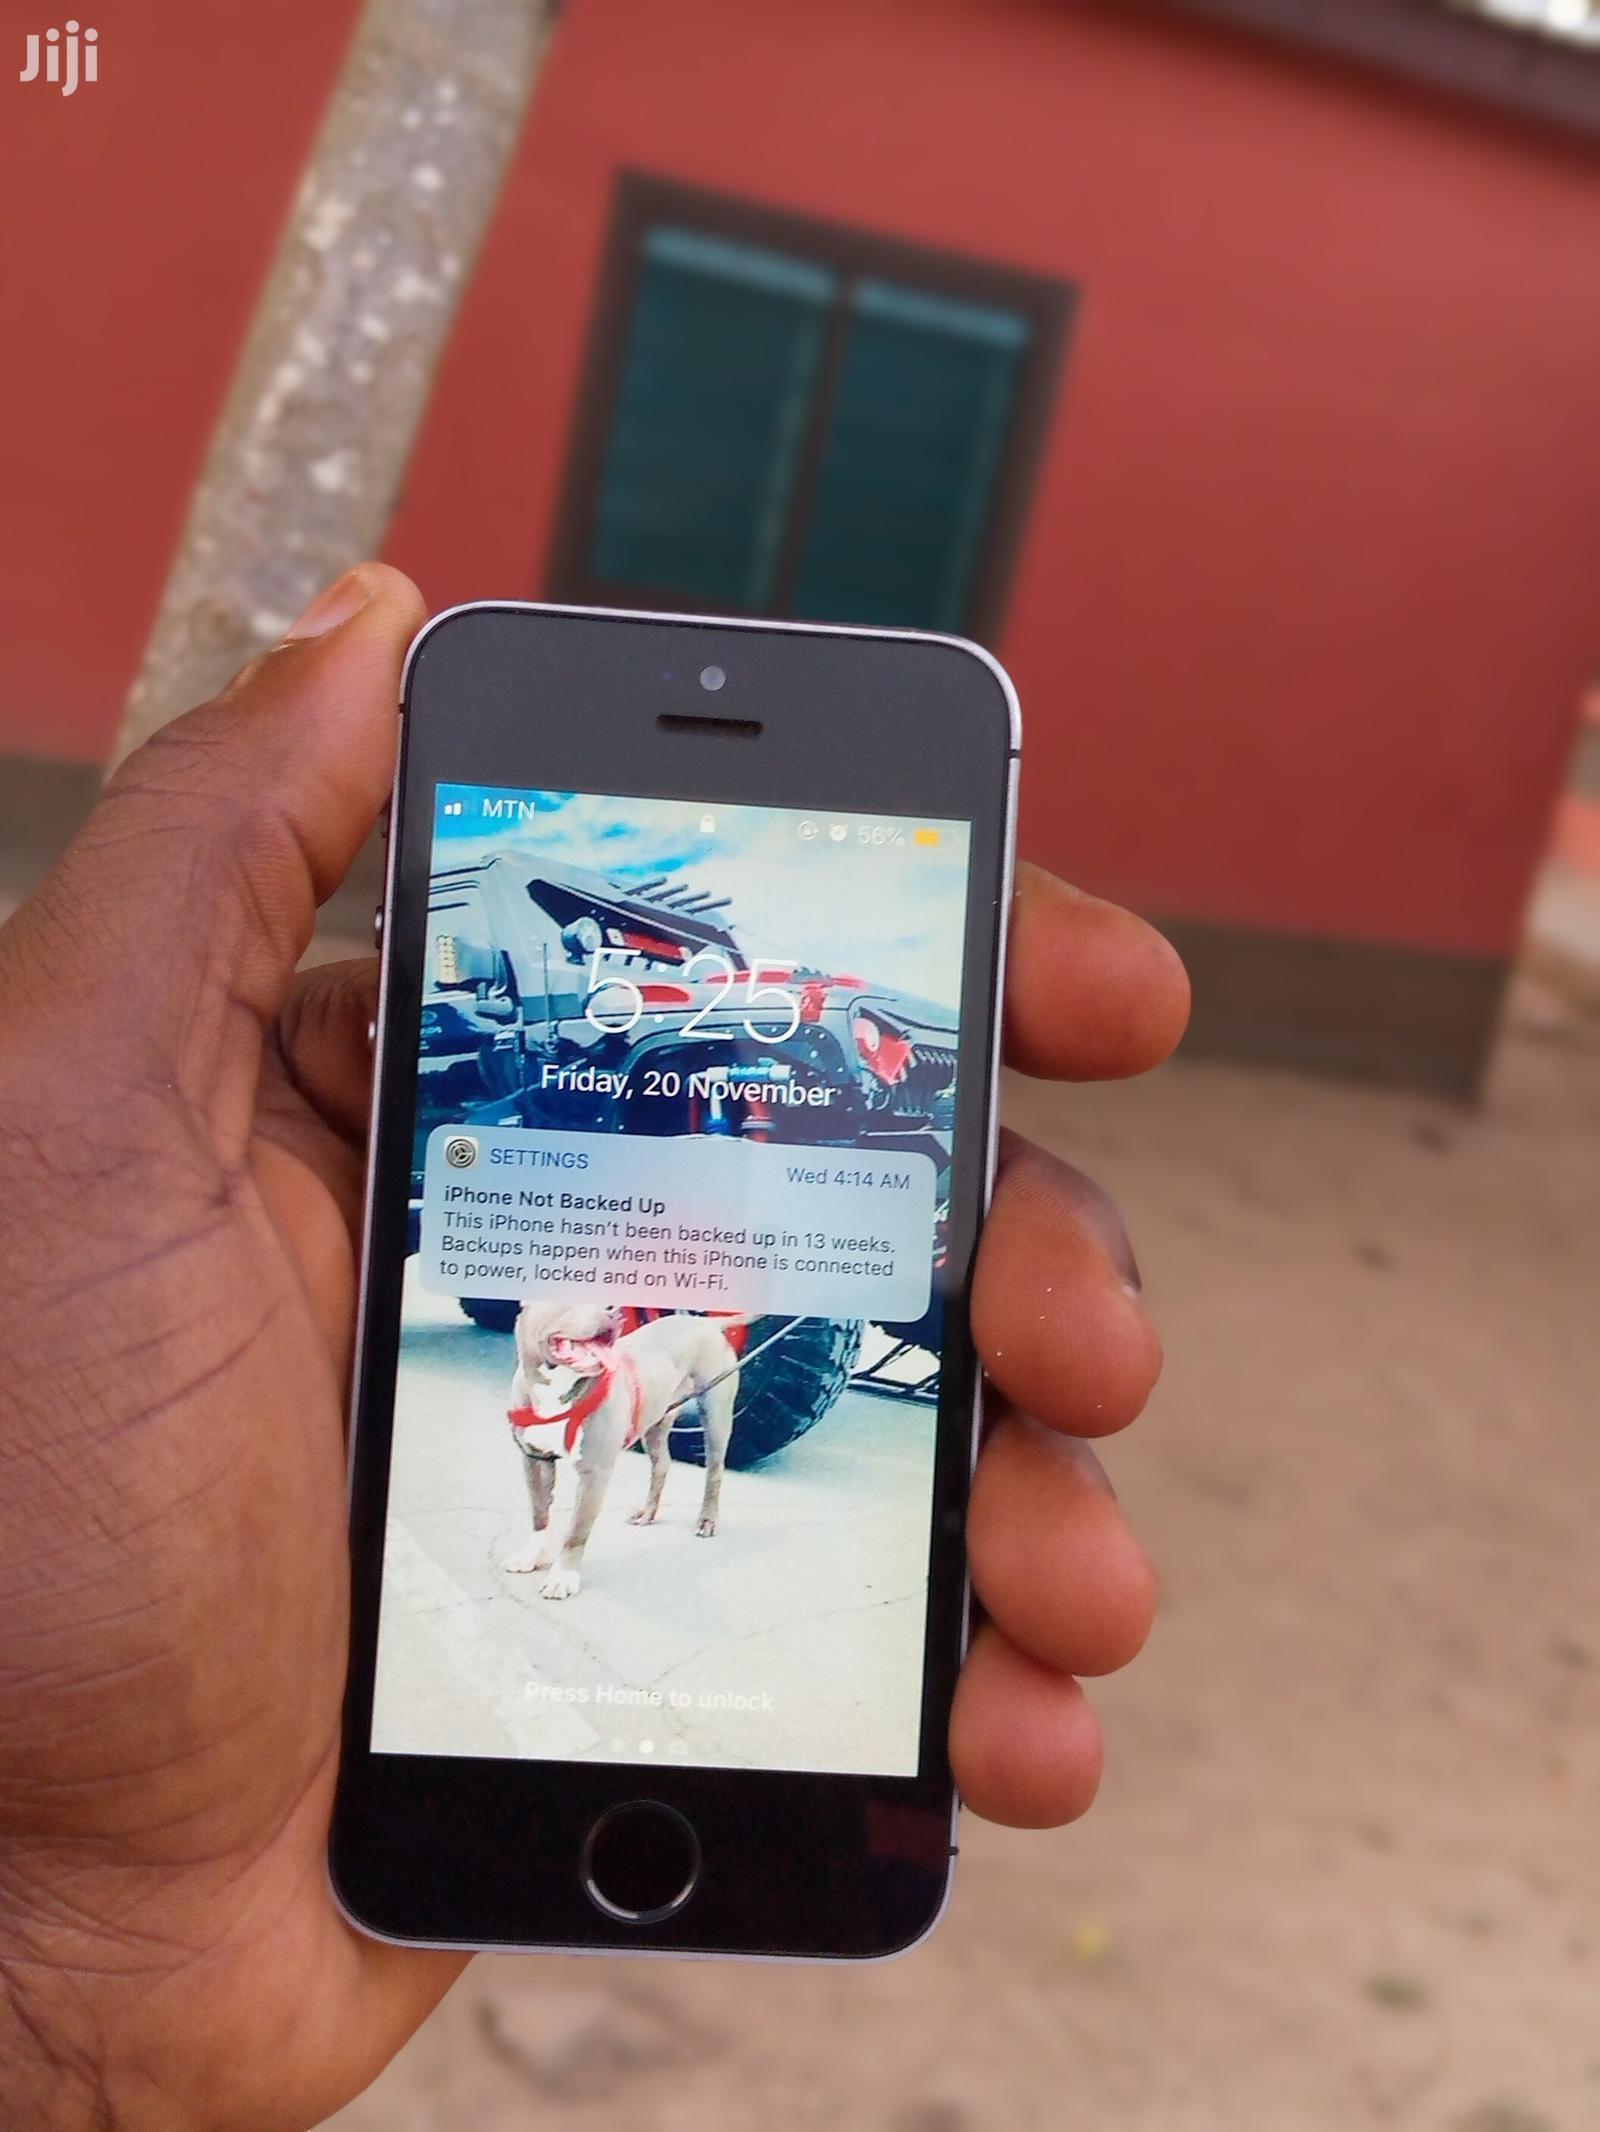 Apple iPhone 5s 32 GB Gray   Mobile Phones for sale in Ketu South Municipal, Volta Region, Ghana